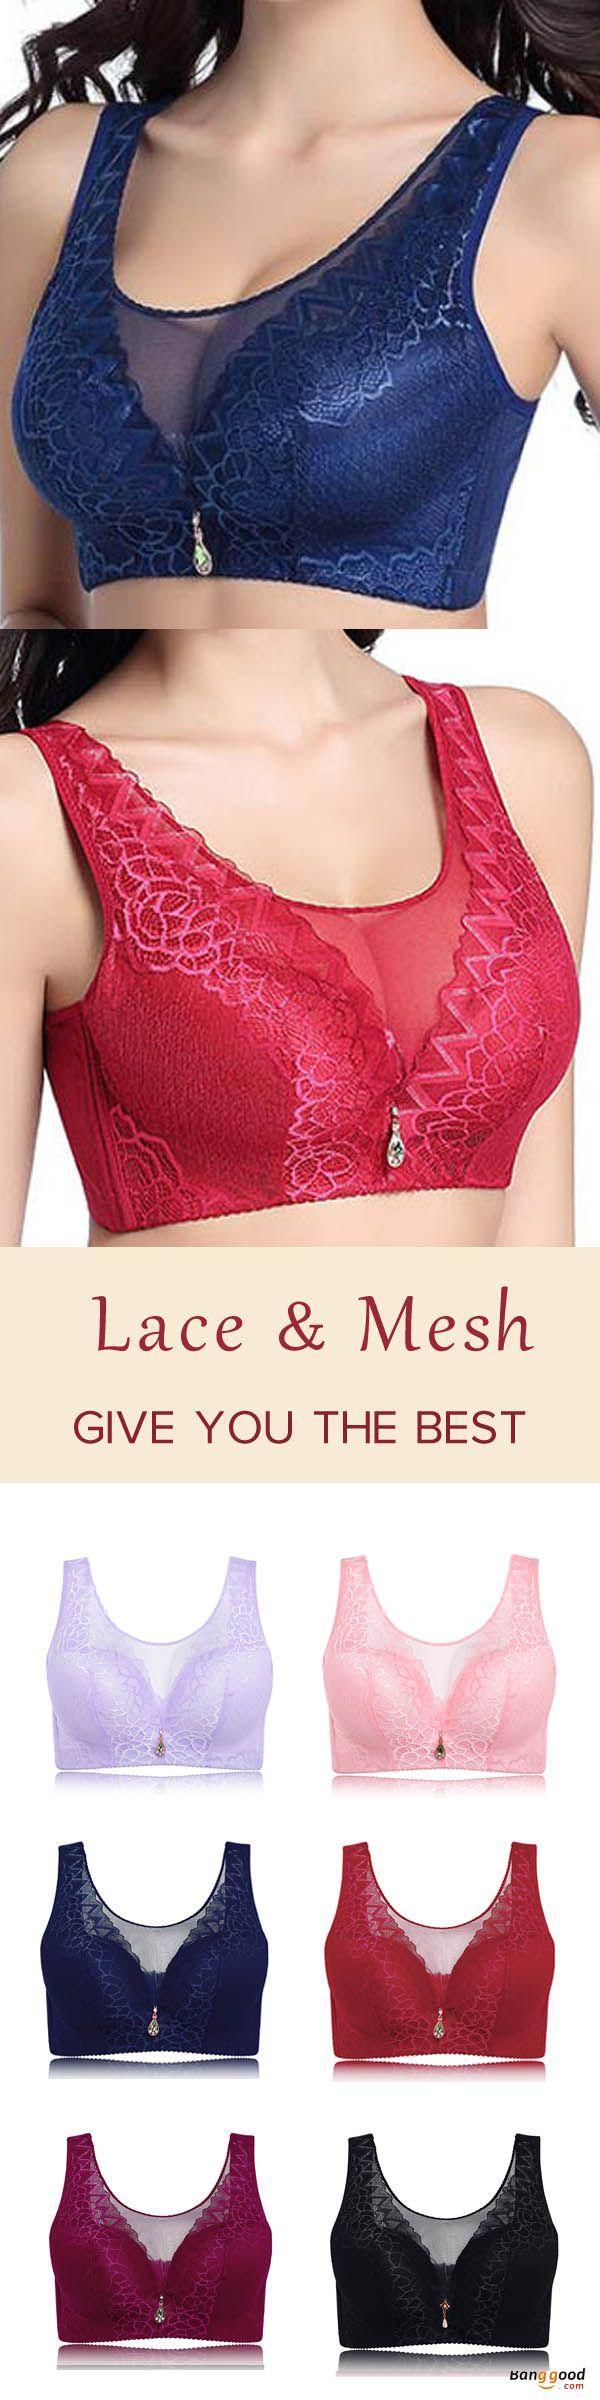 US$14.89 + Free shipping. Women Bra, Wireless Bra, Lace Bra, Bandeau Bra, Push Up Bra, Wonderbra, Plus Size Bras.